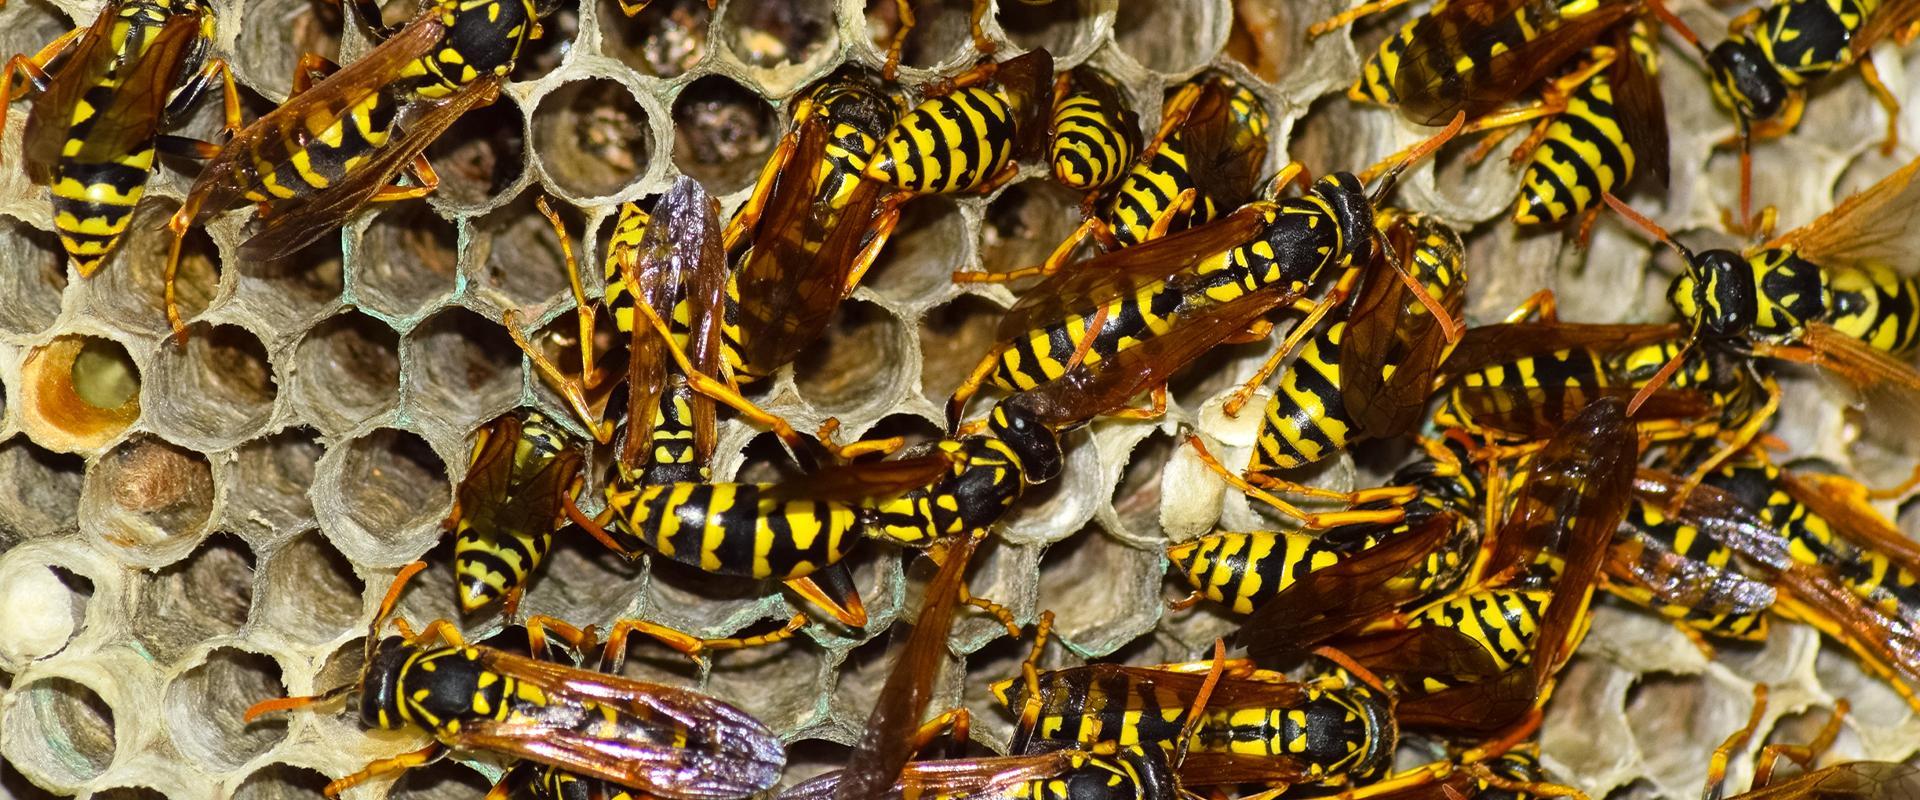 wasps in their nest in meridian idaho